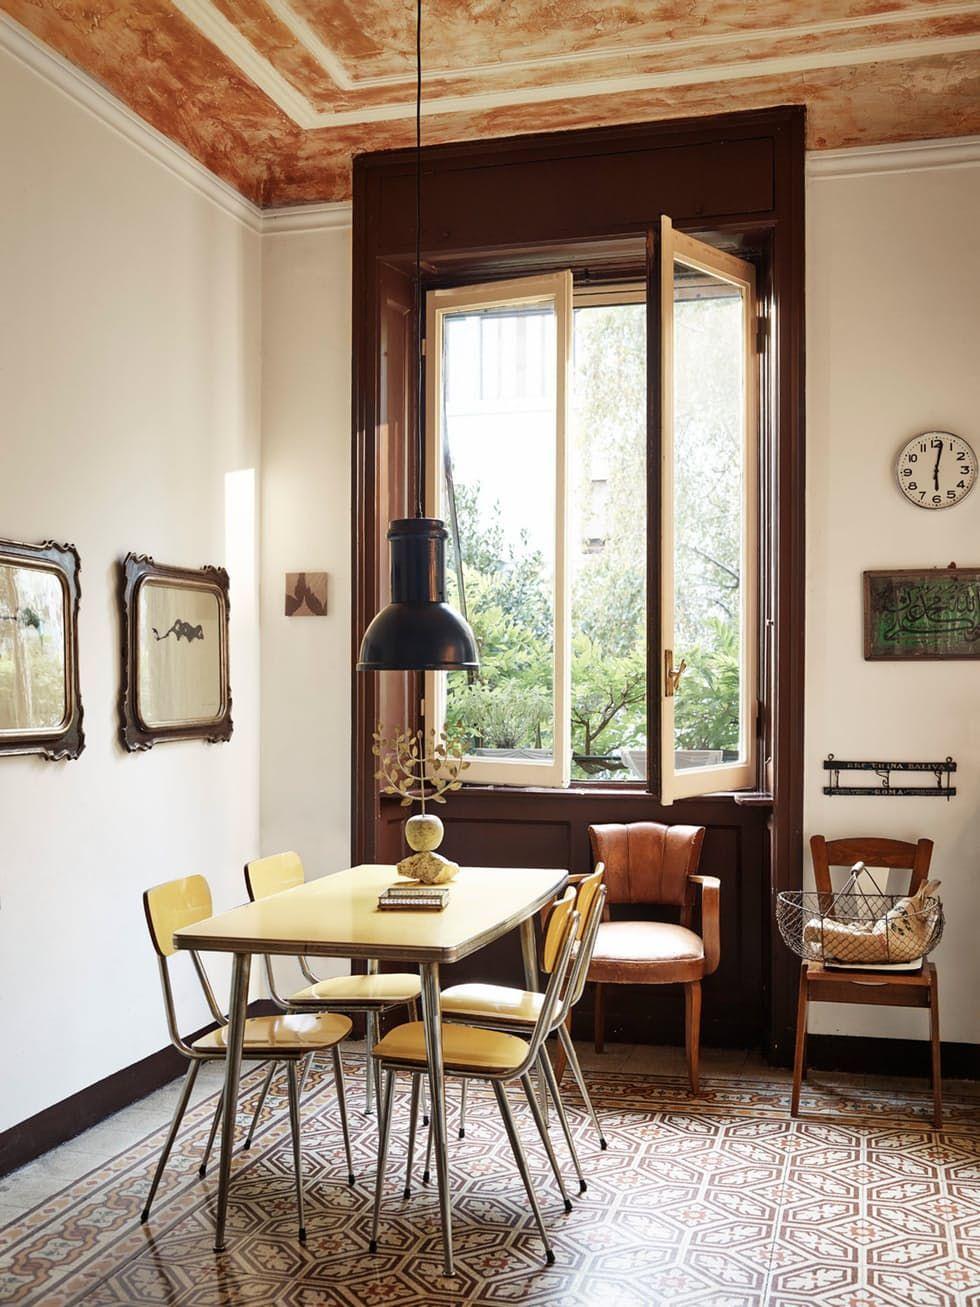 Pin by homegirl studio on dining delights in pinterest